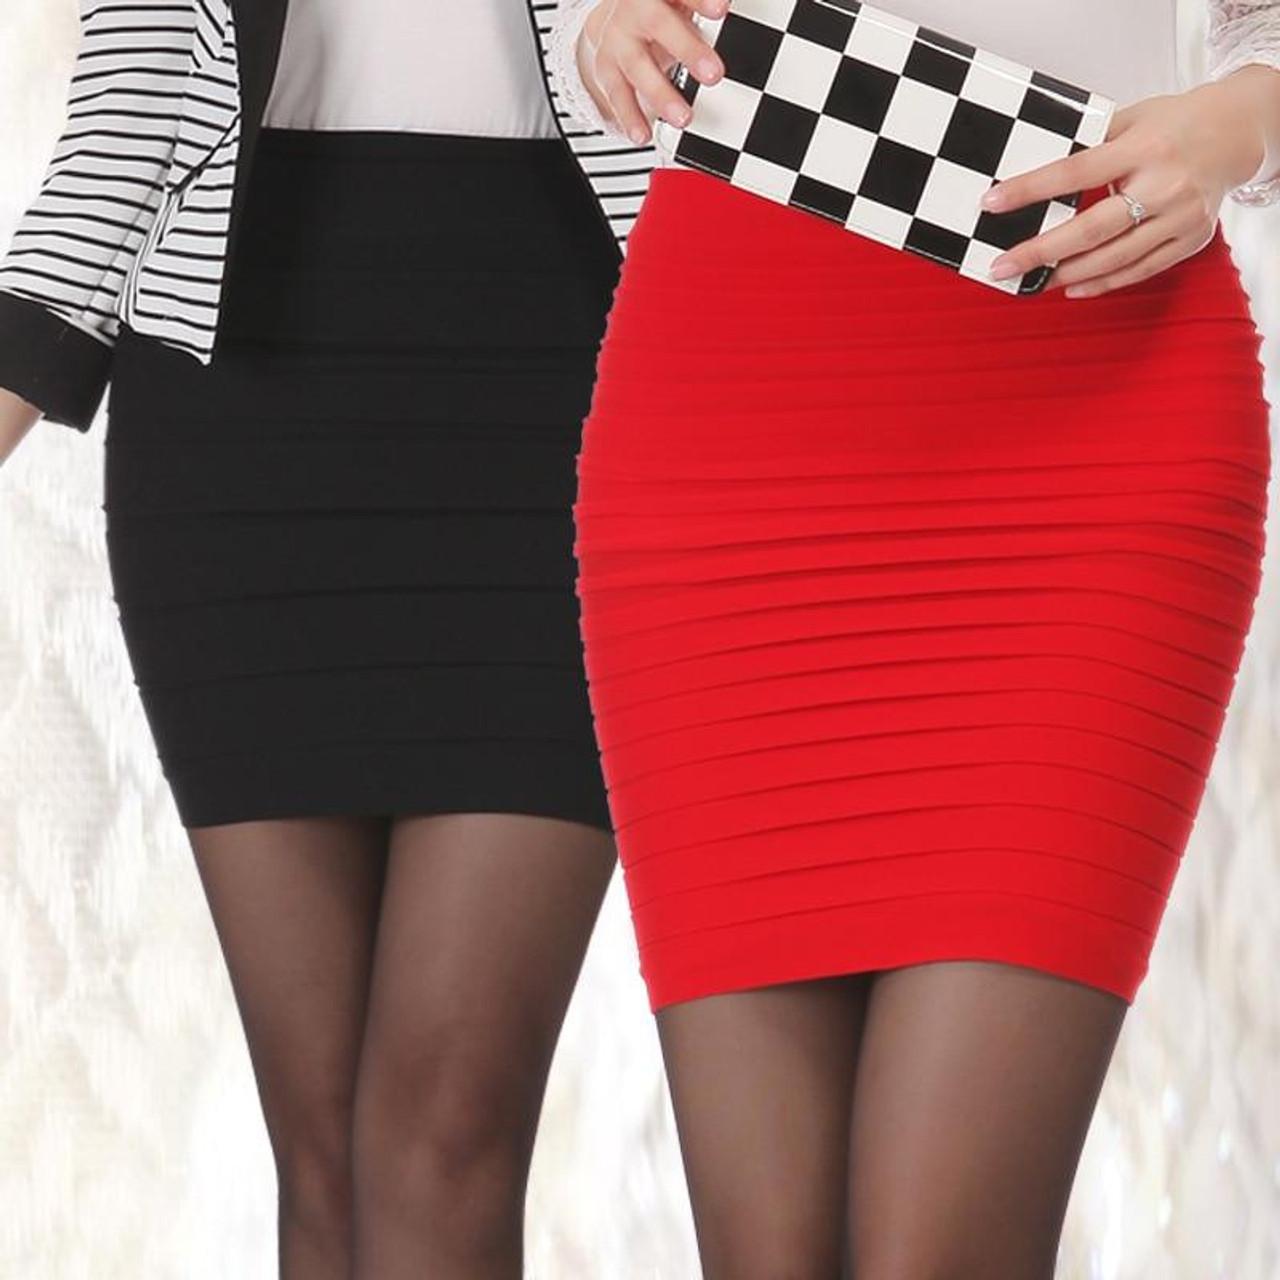 Fashion Summer Skirt High Waist Elastic Pleated Short Skirt Candy Color Skinny Mini Skirt,deep Green